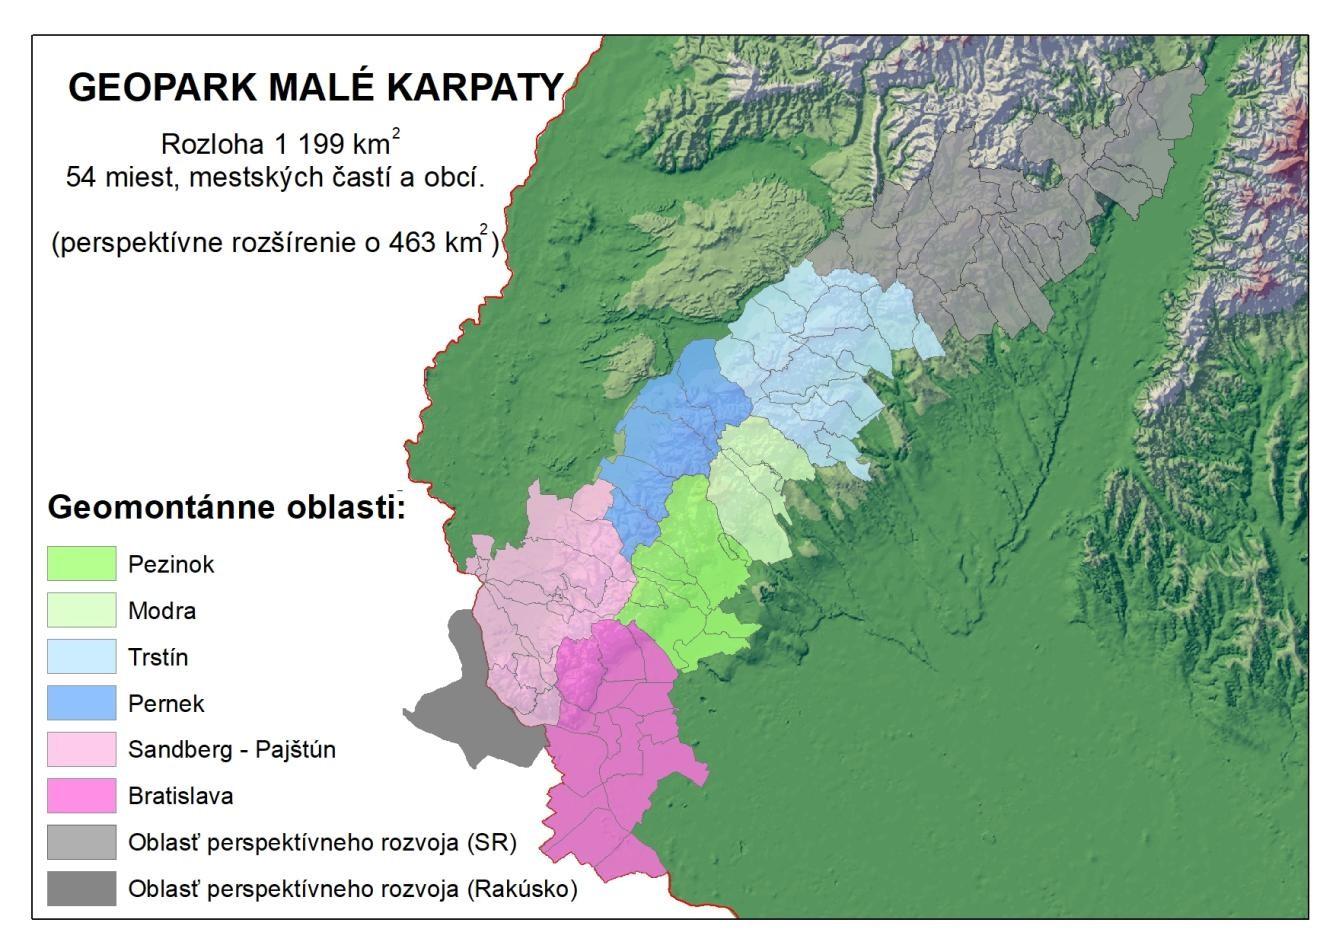 geopark malé karpaty mapa